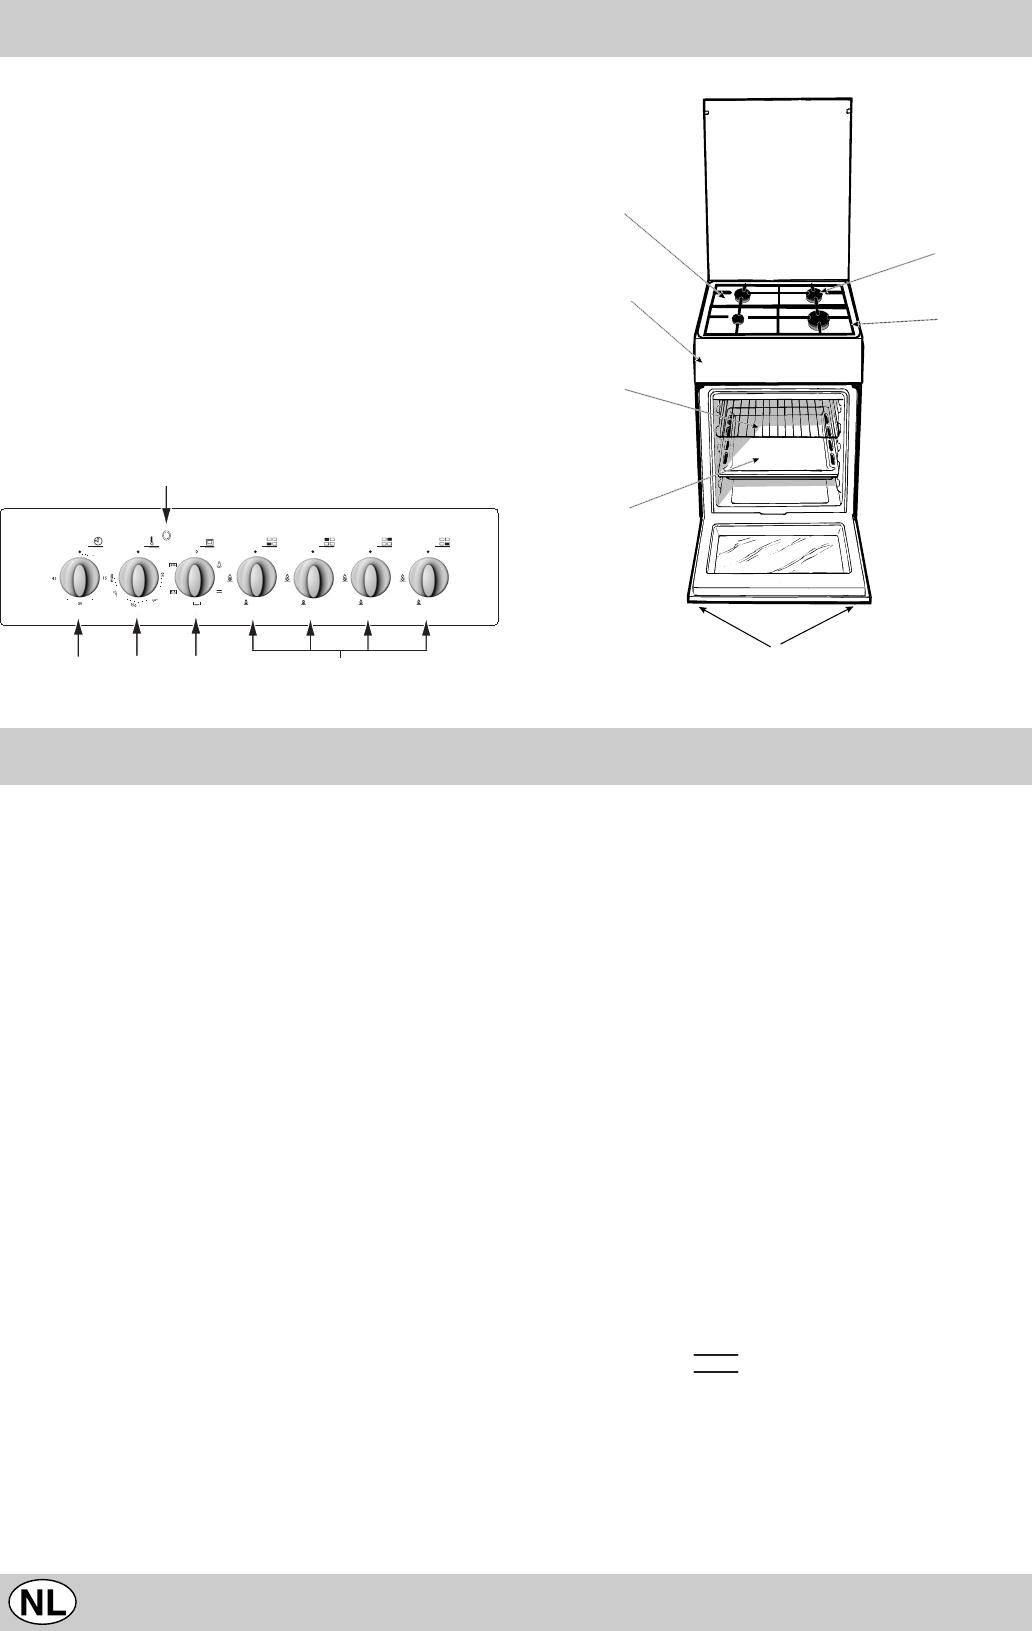 Indesit gasfornuis met oven handleiding